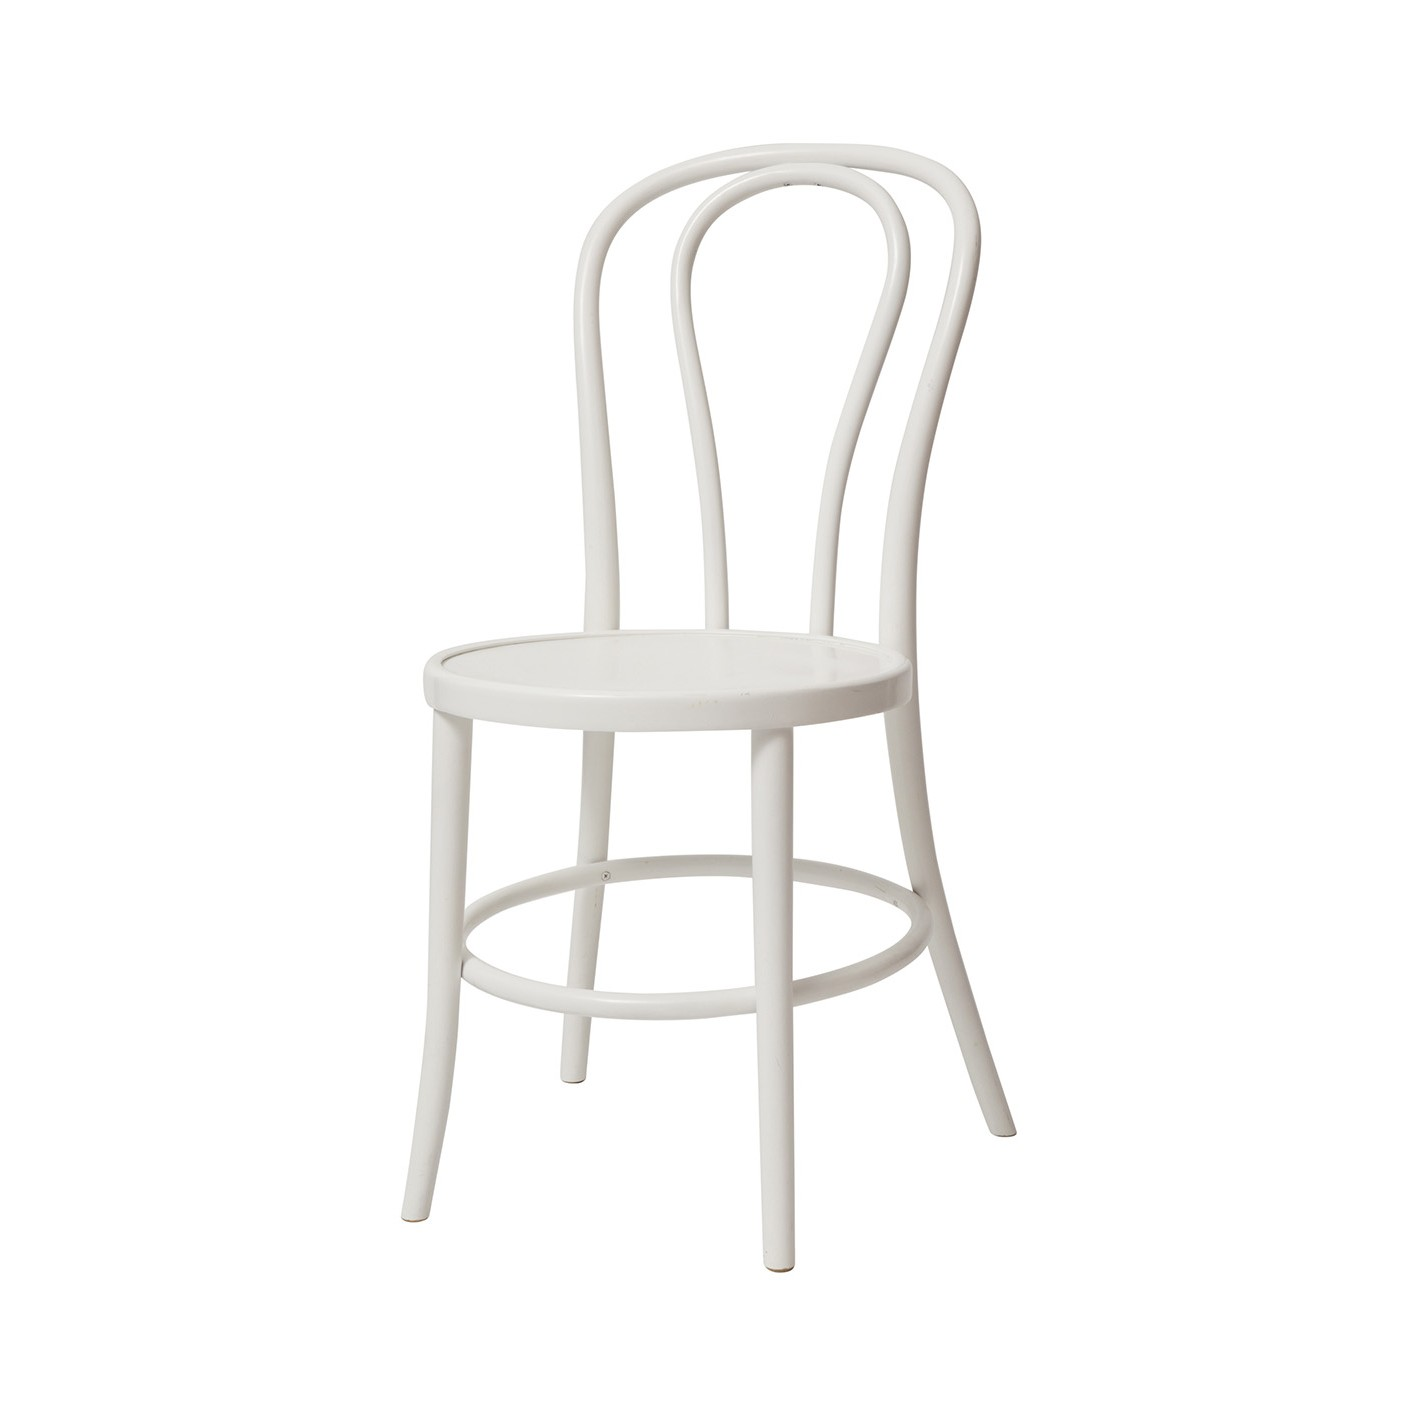 Bentwood Chair Stackable Colour Jmh Wholesale Furniture